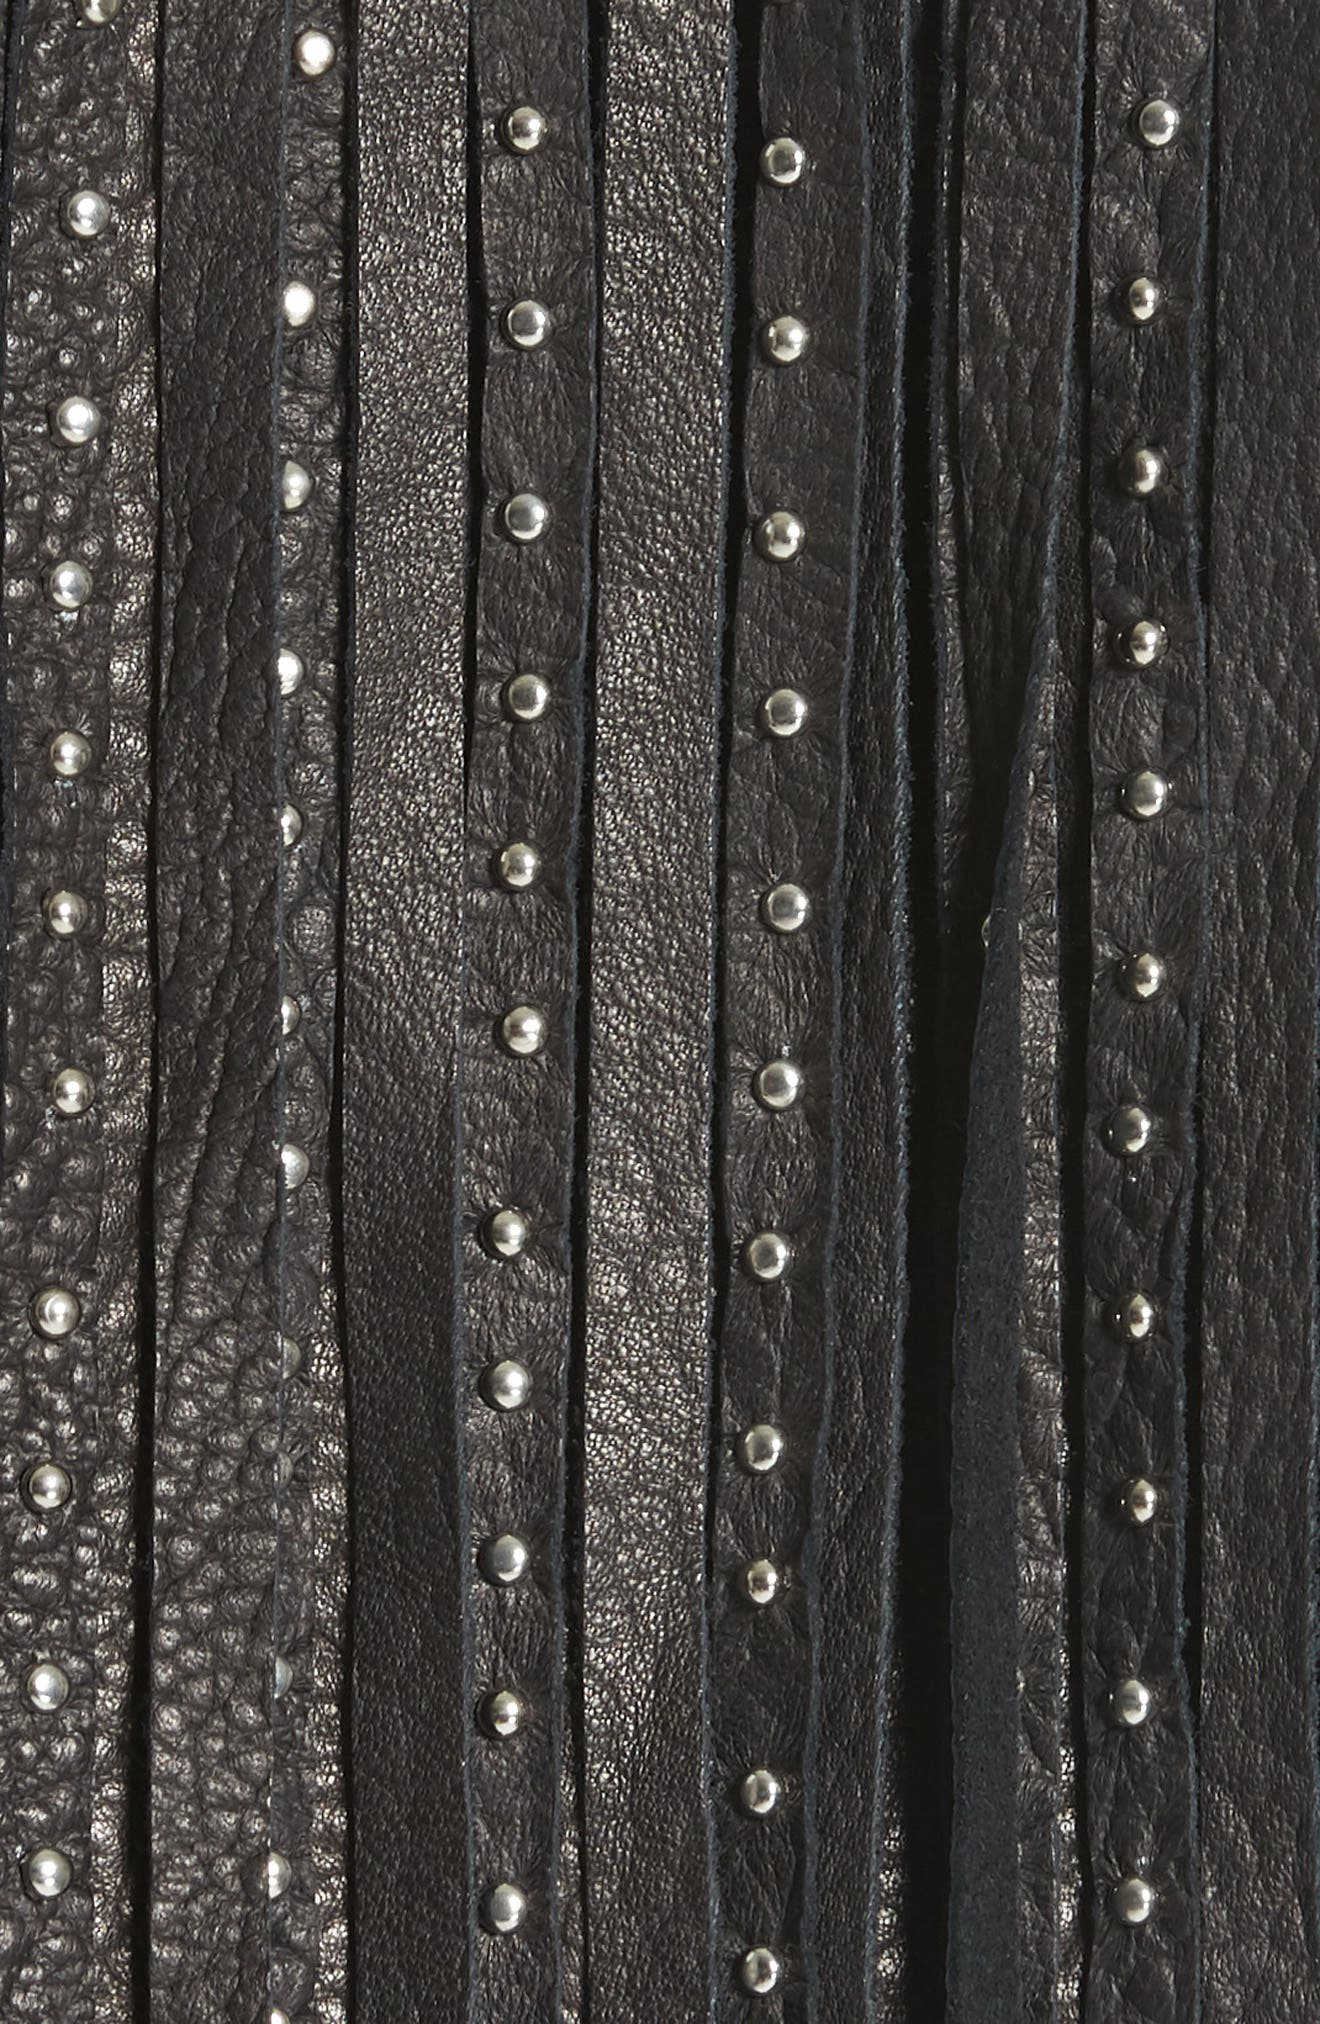 Studded Lace Inset Leather Jacket,                             Alternate thumbnail 5, color,                             Jet Optic